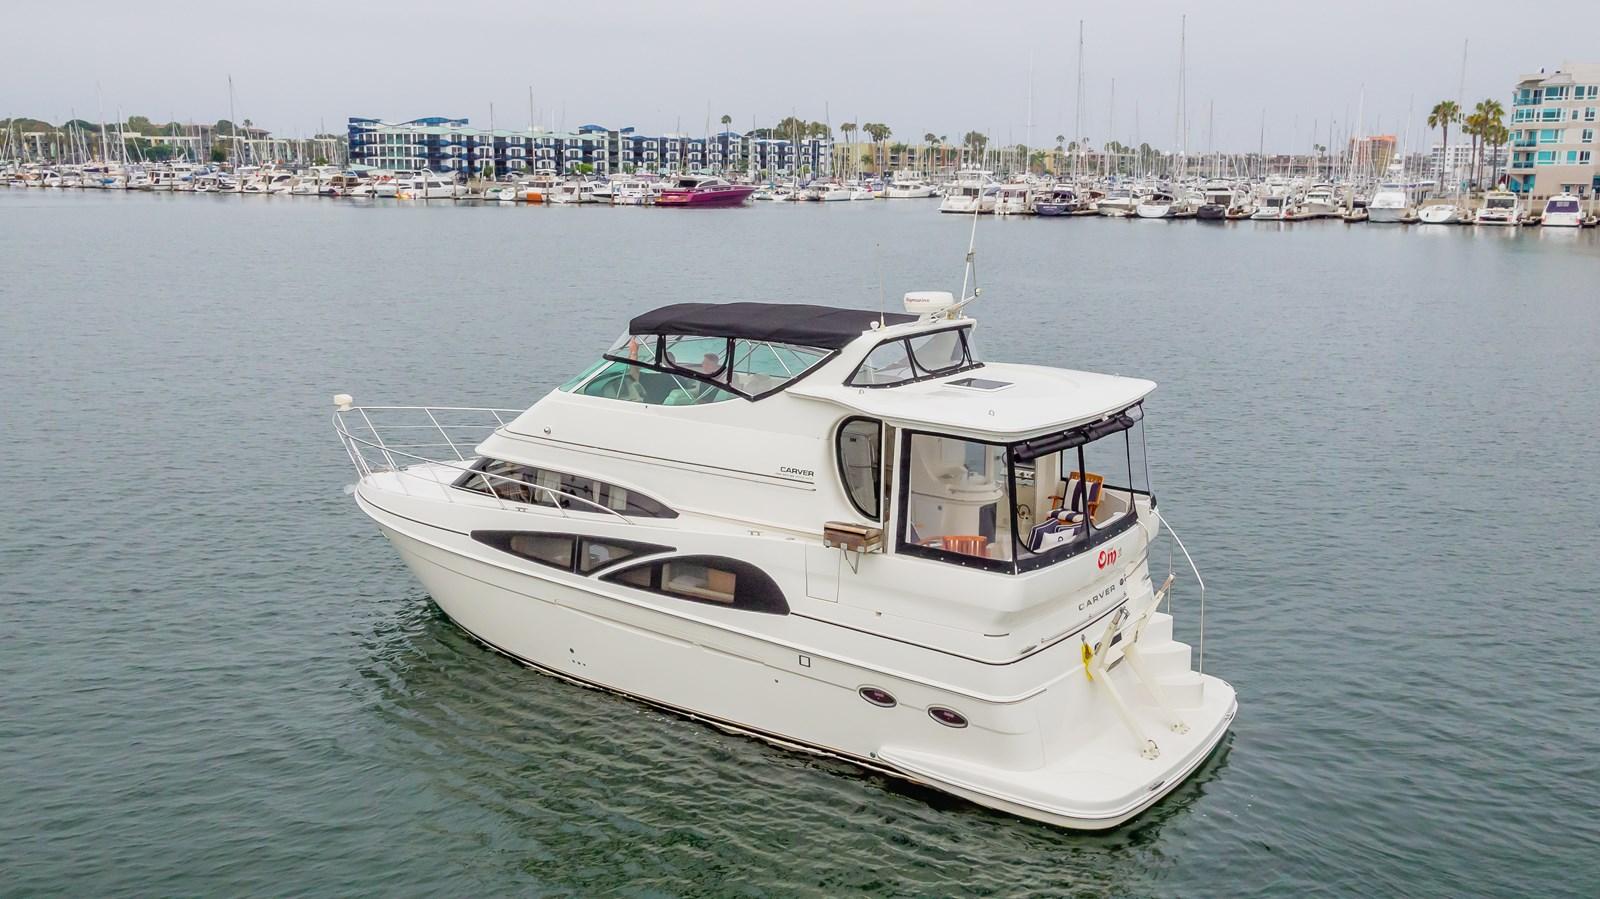 DJI_0024 2005 CARVER  Motor Yacht 2737798